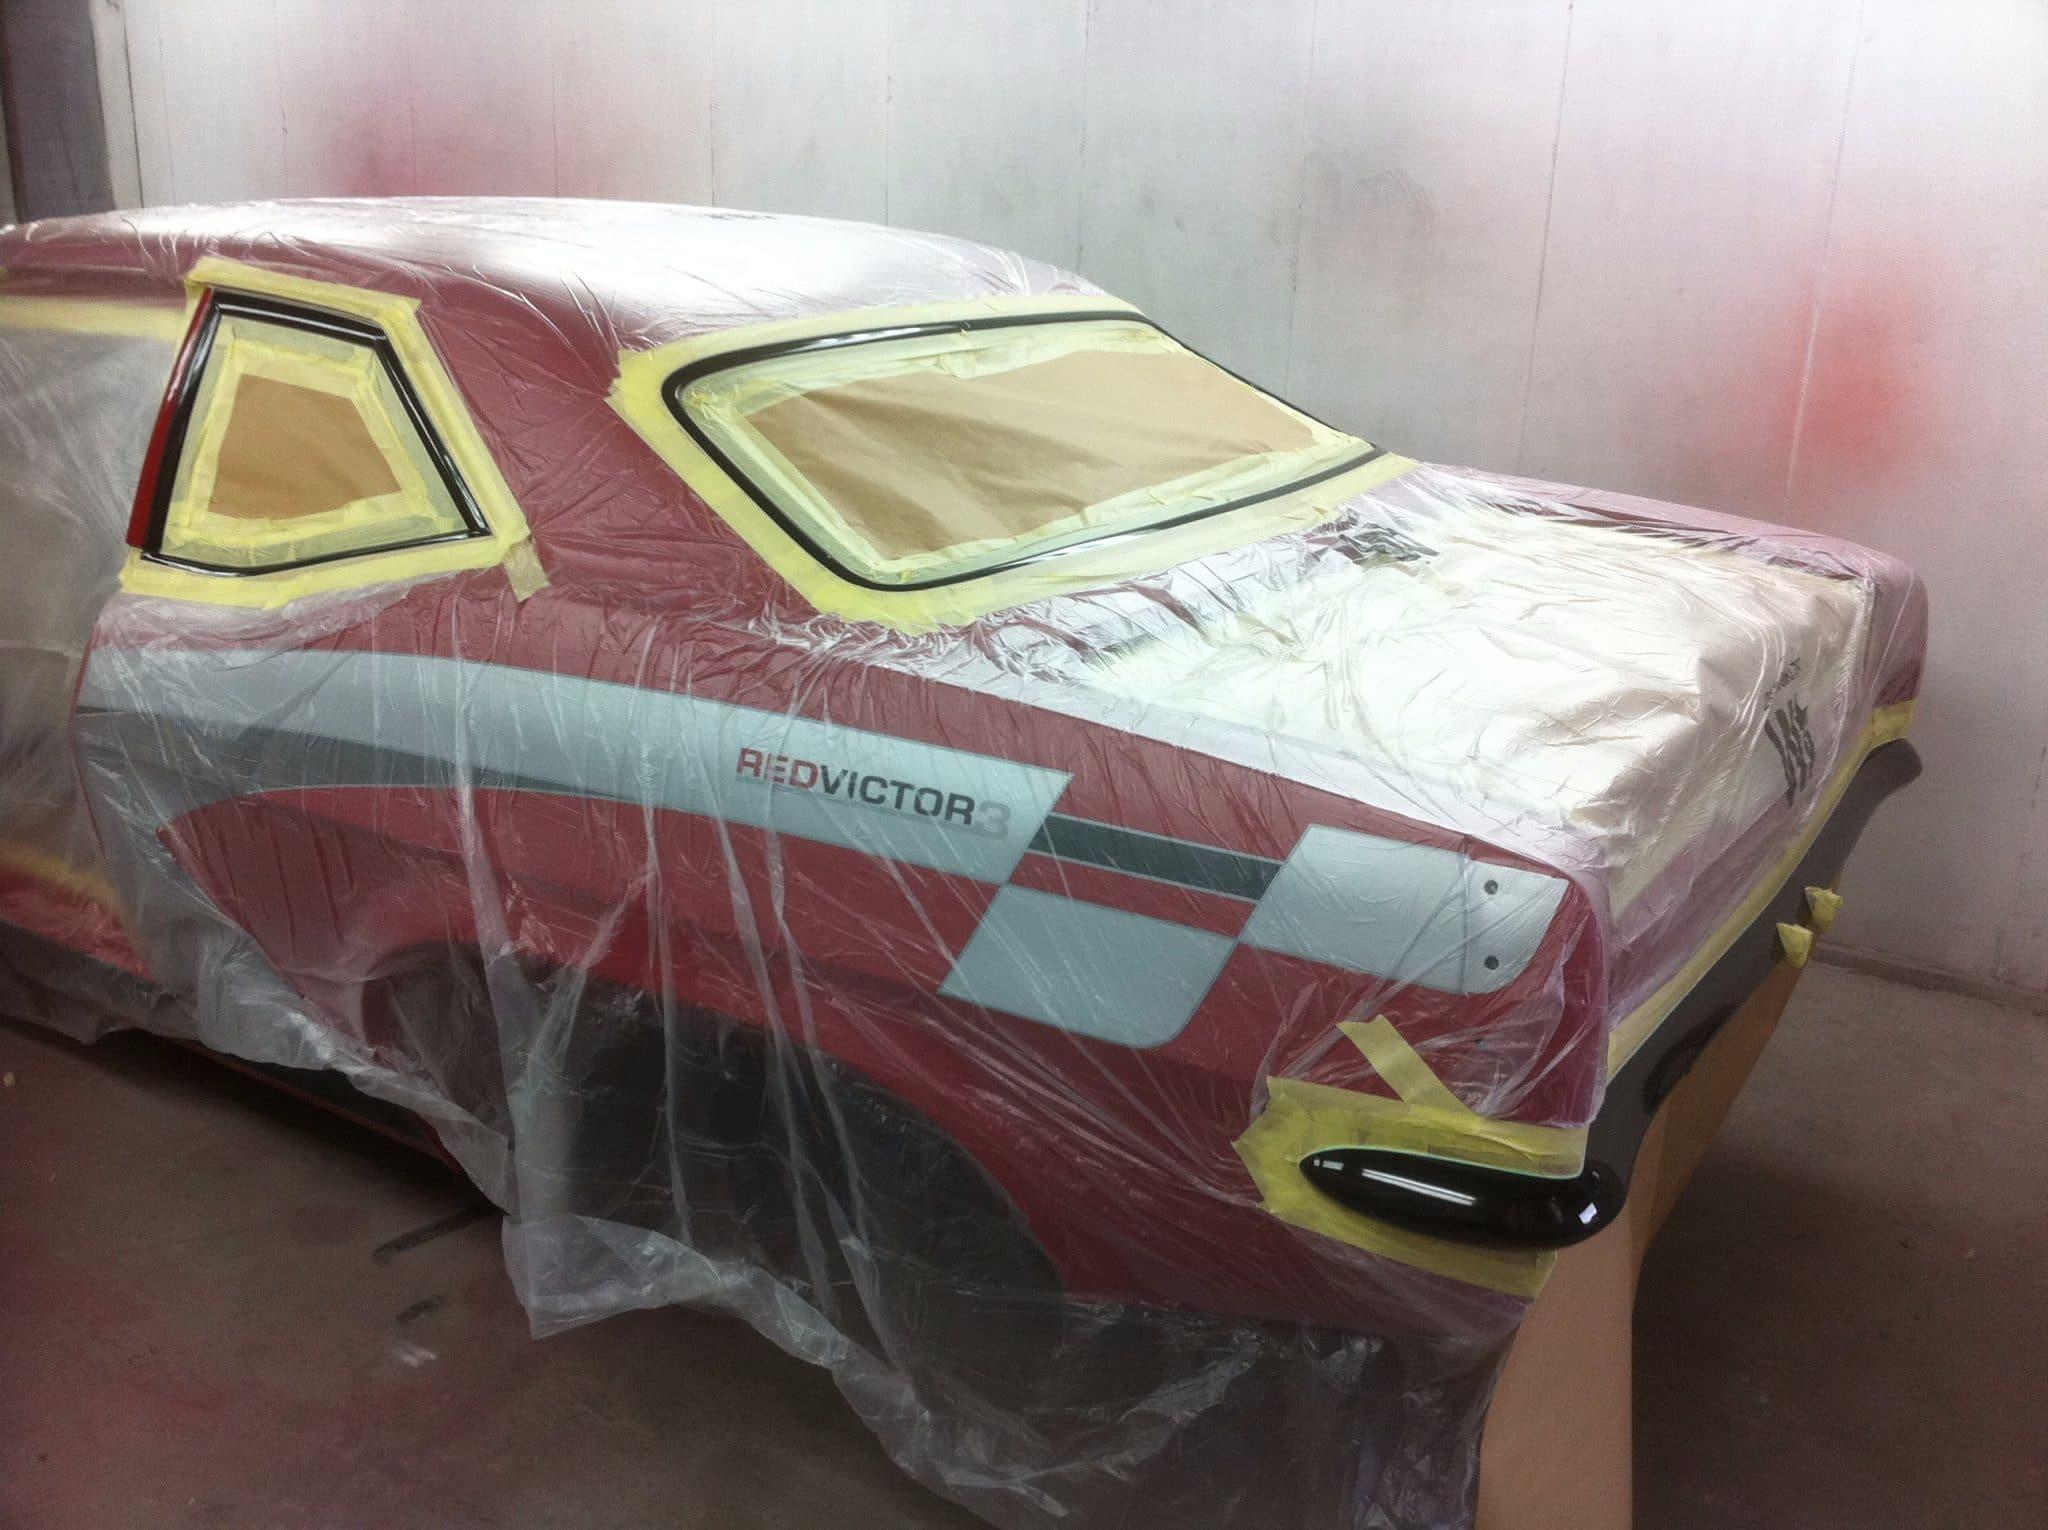 red victor 3 restoration in progress